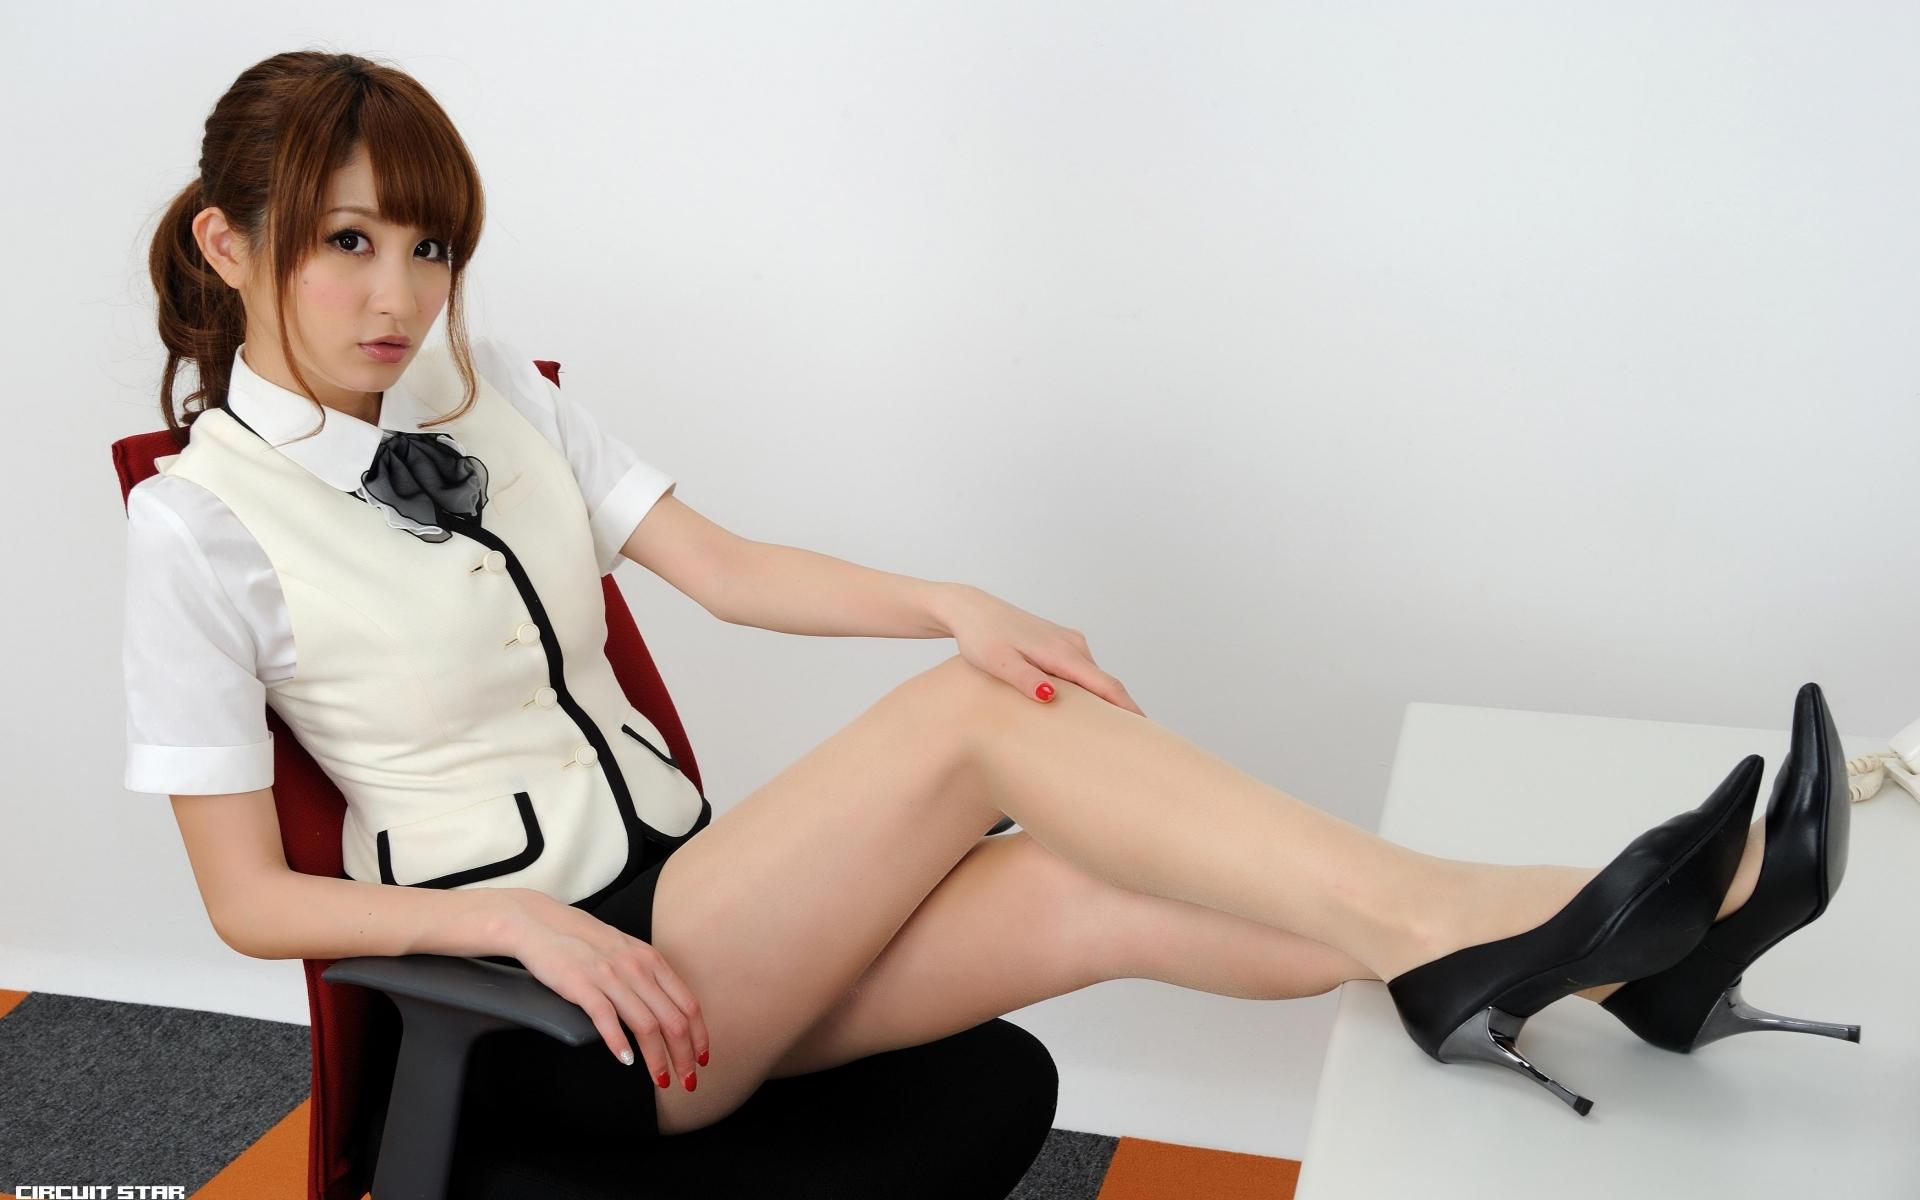 legs women stars models japanese 4189x2787 wallpaper Wallpaper 1920x1200